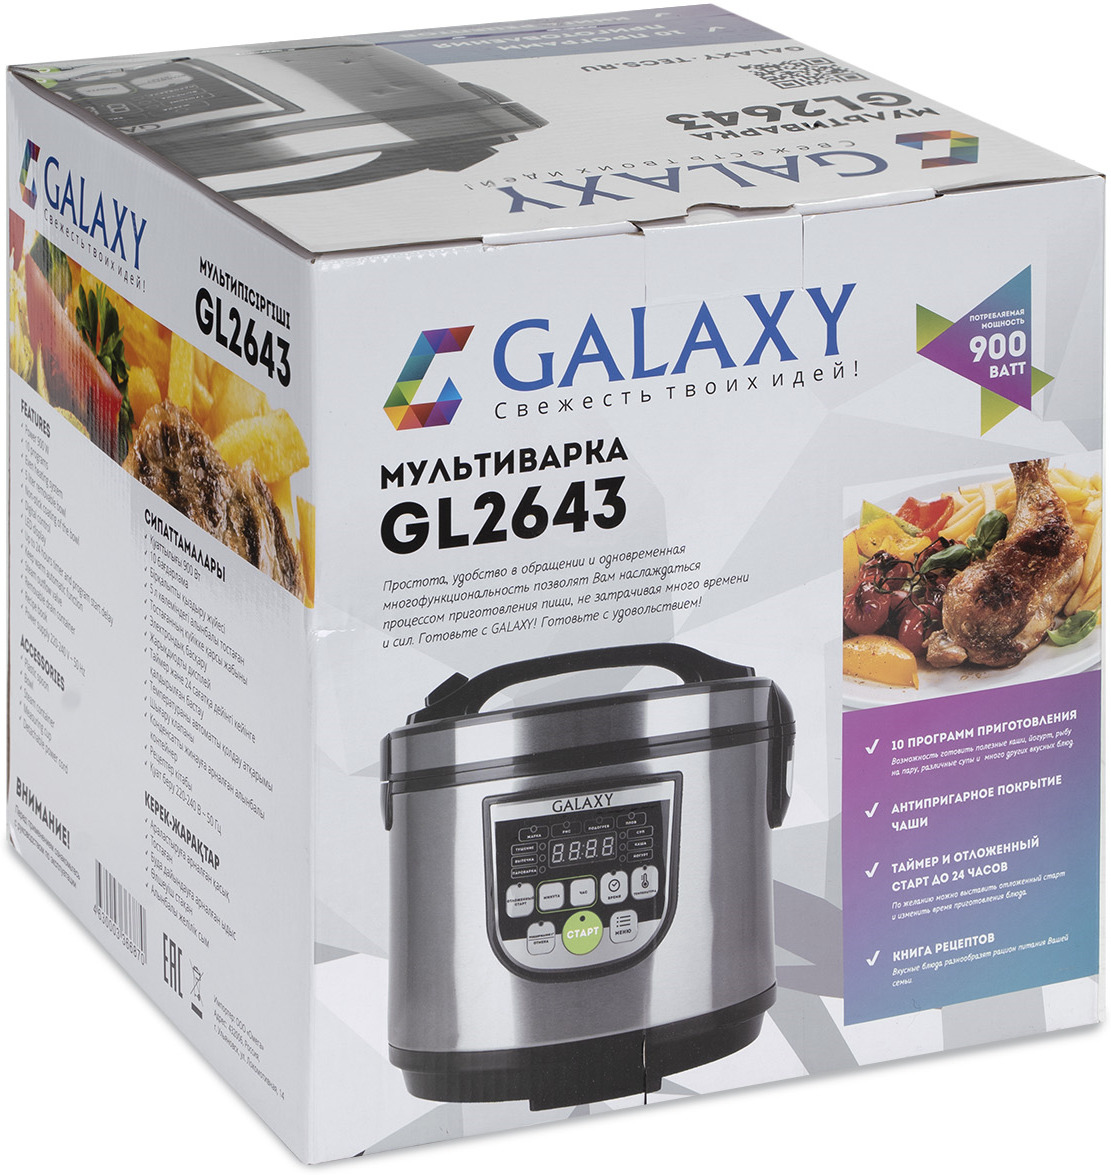 Мультиварка Galaxy GL 2643, черный, серый металлик Galaxy